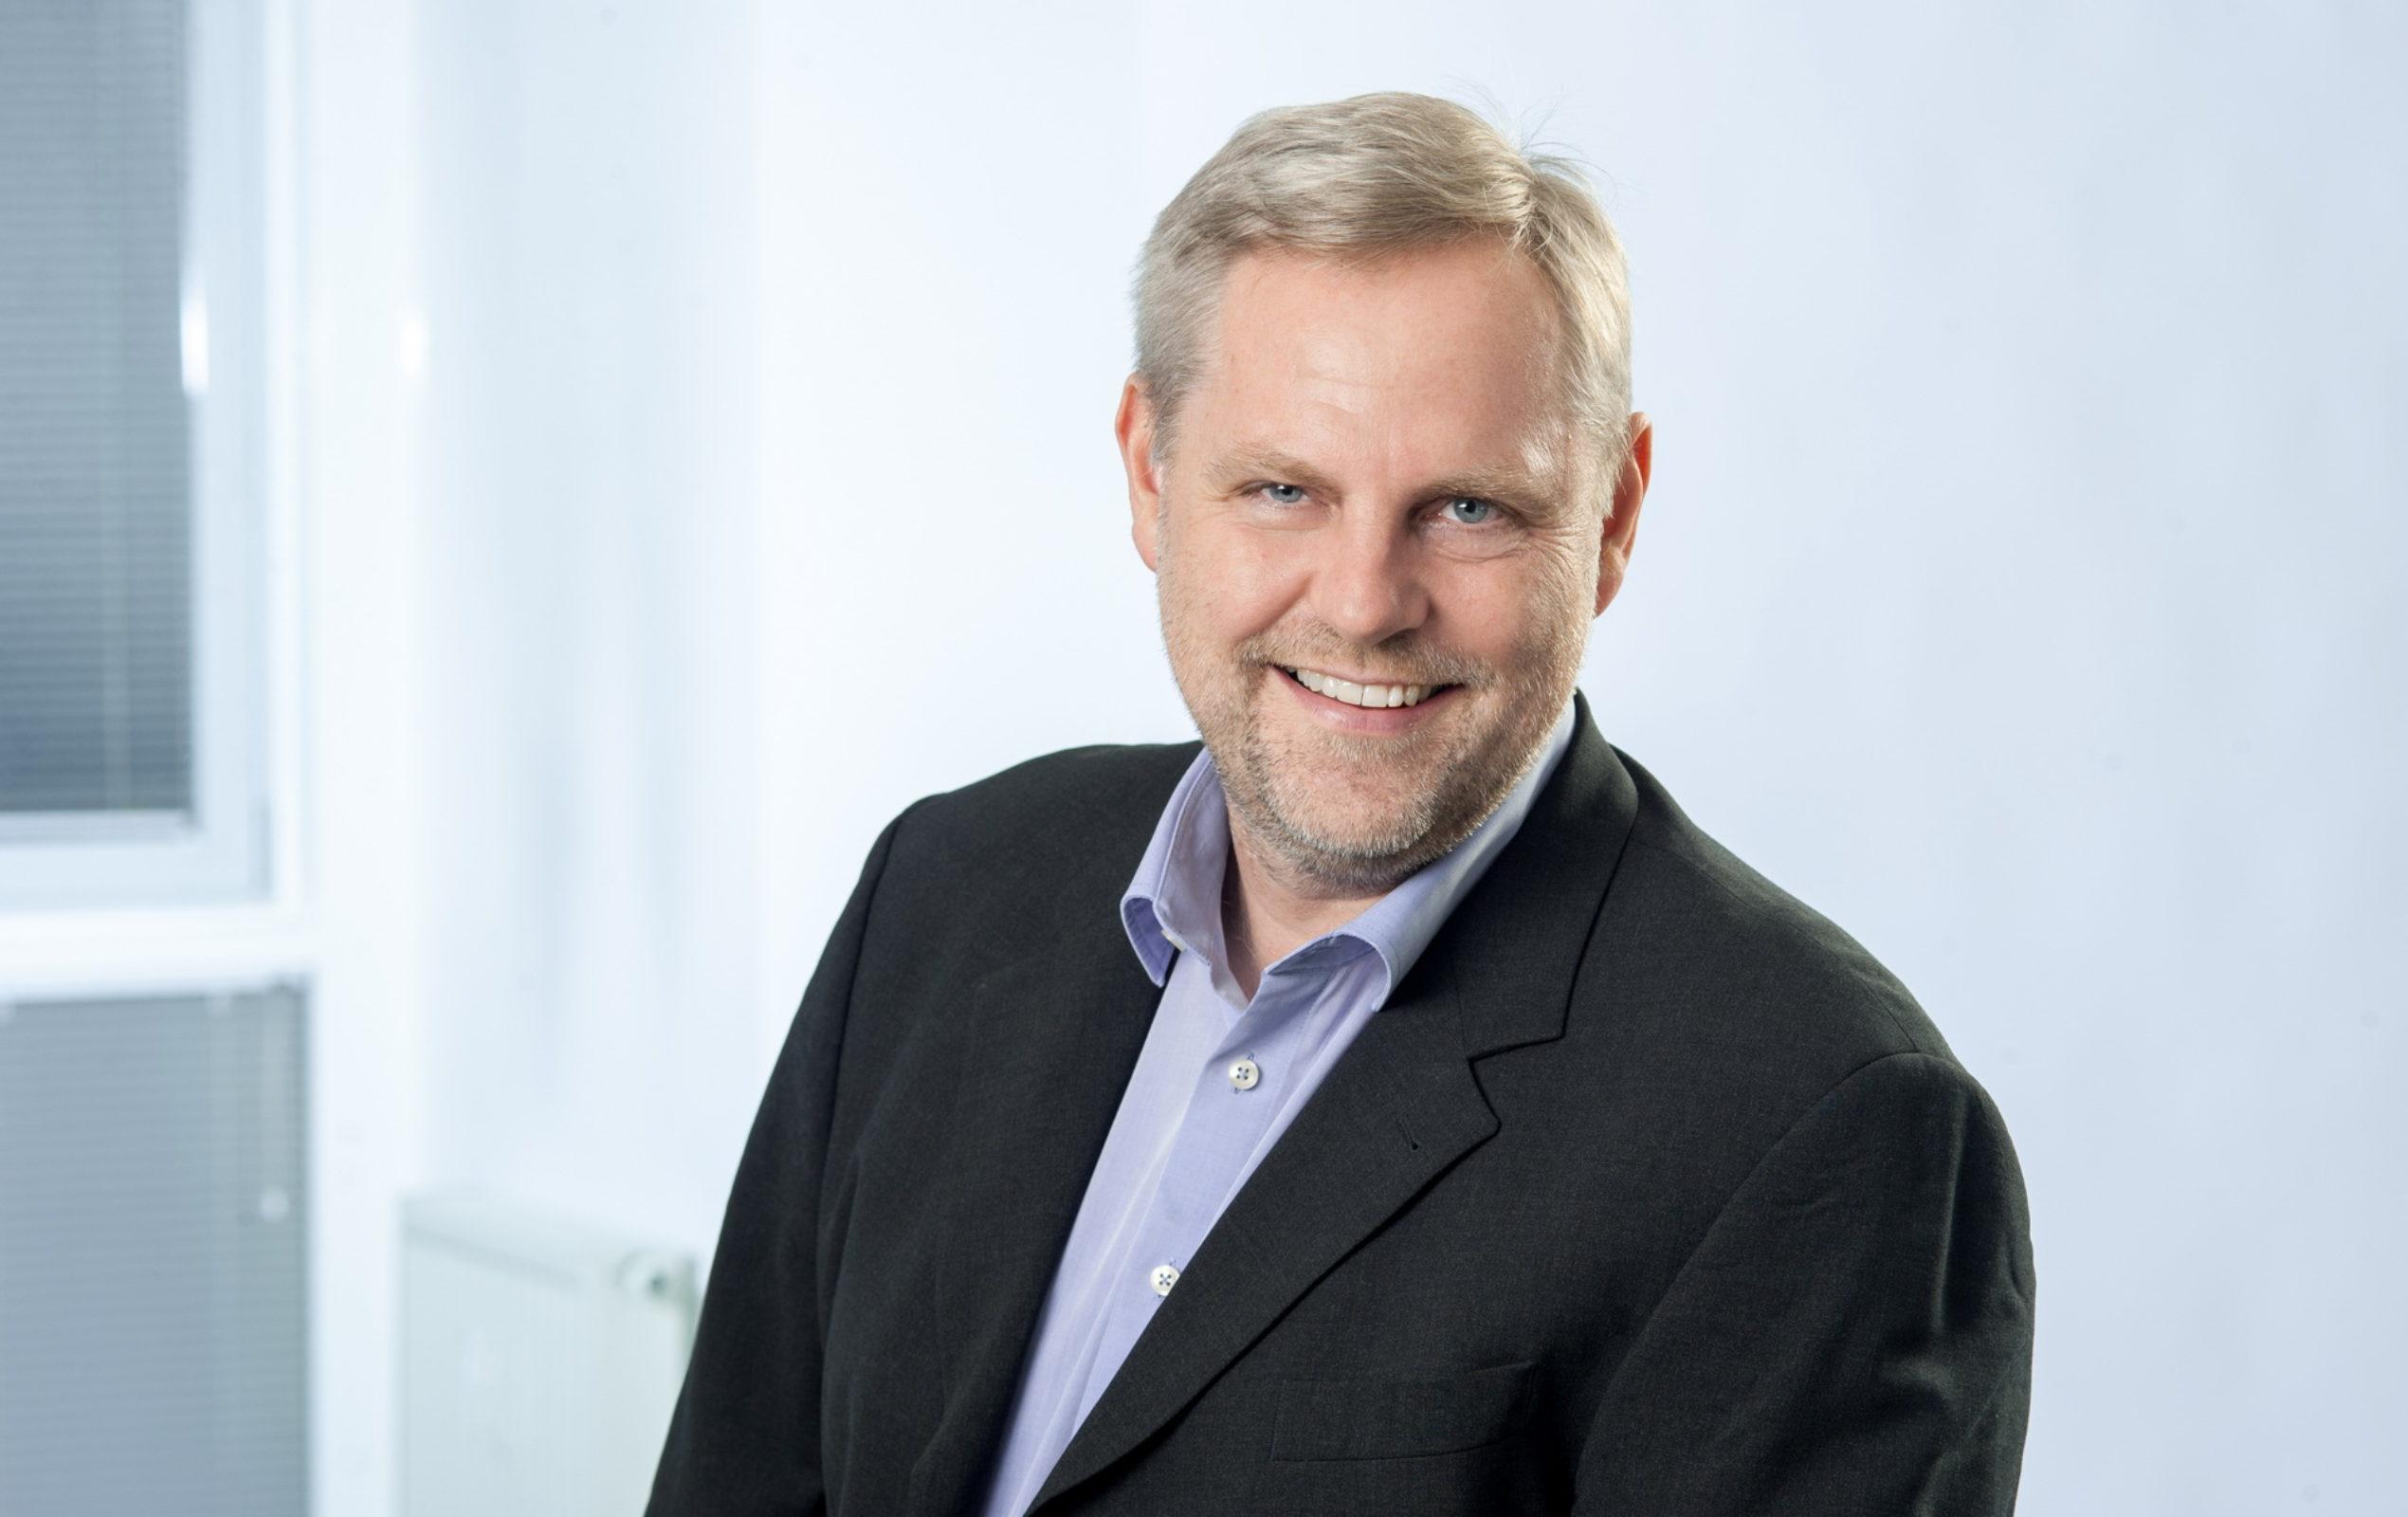 Steuerberater Graz – Mag. Dr. Georg Kristoferitsch – Steuerberatung einmal anders